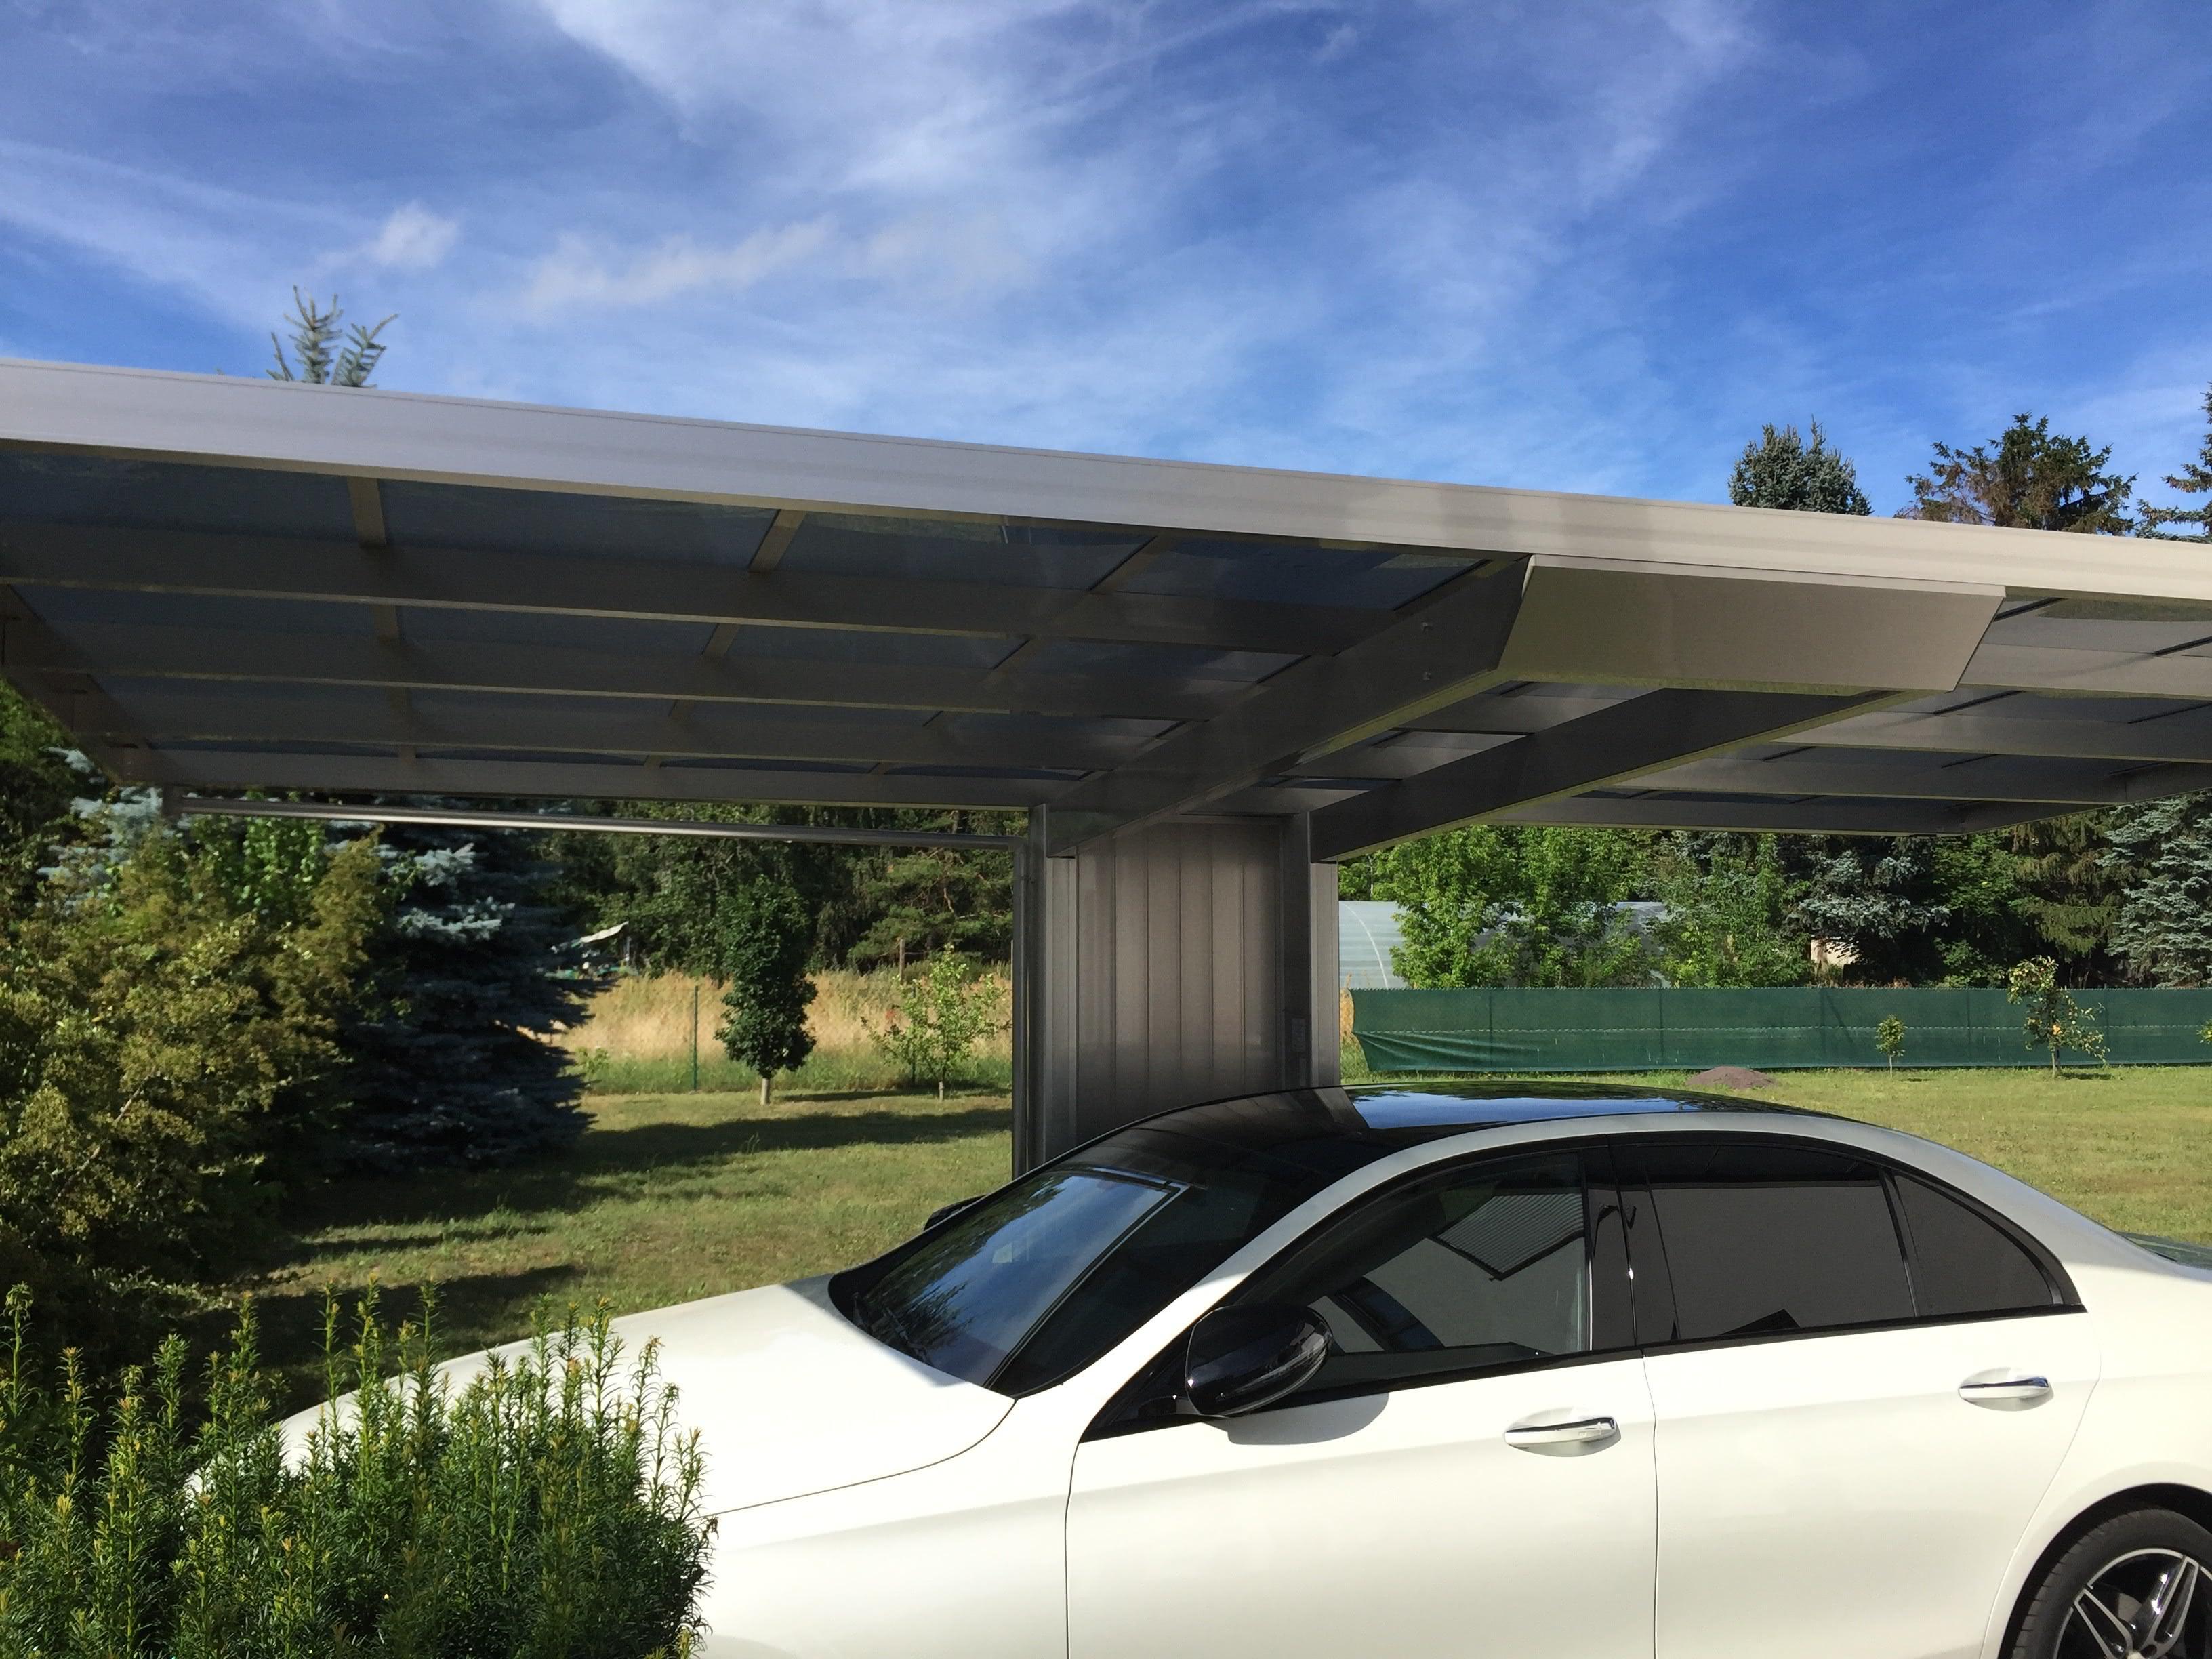 Alu-Carports - Carports aus Aluminium